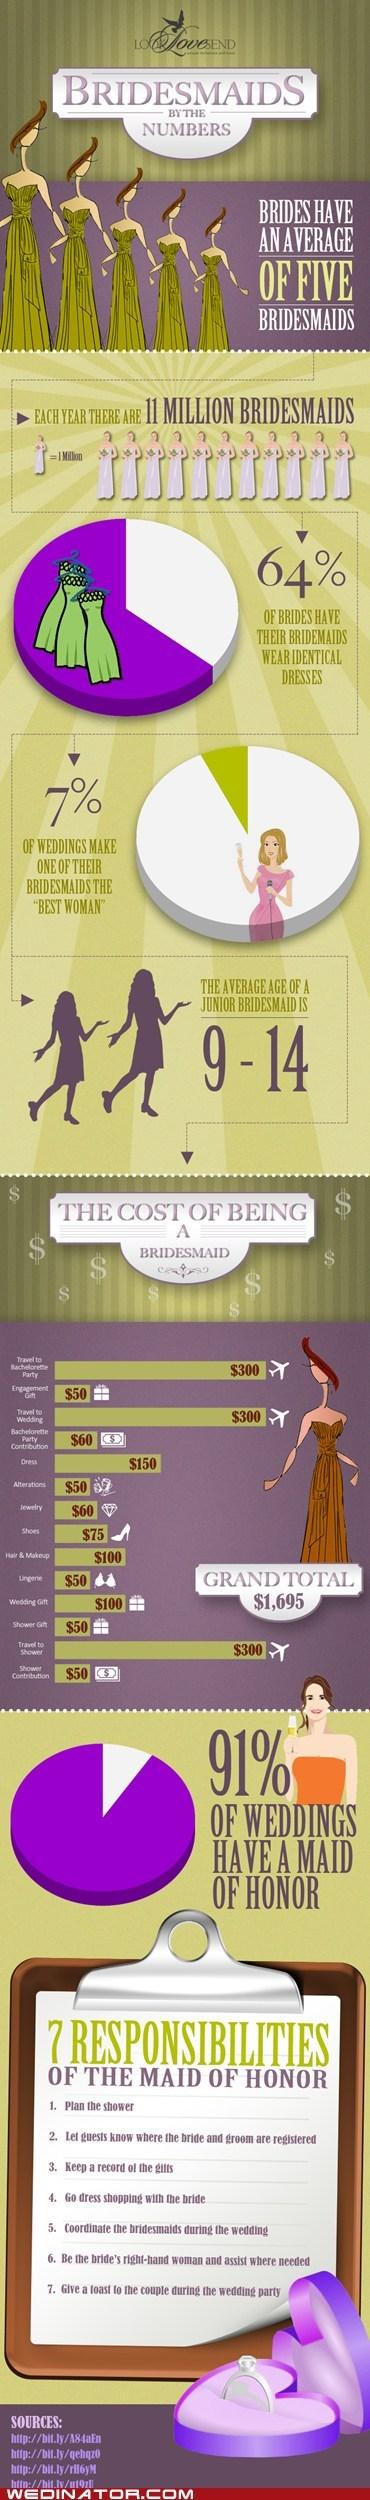 bridesmaids funny wedding photos infographics money - 6472631040